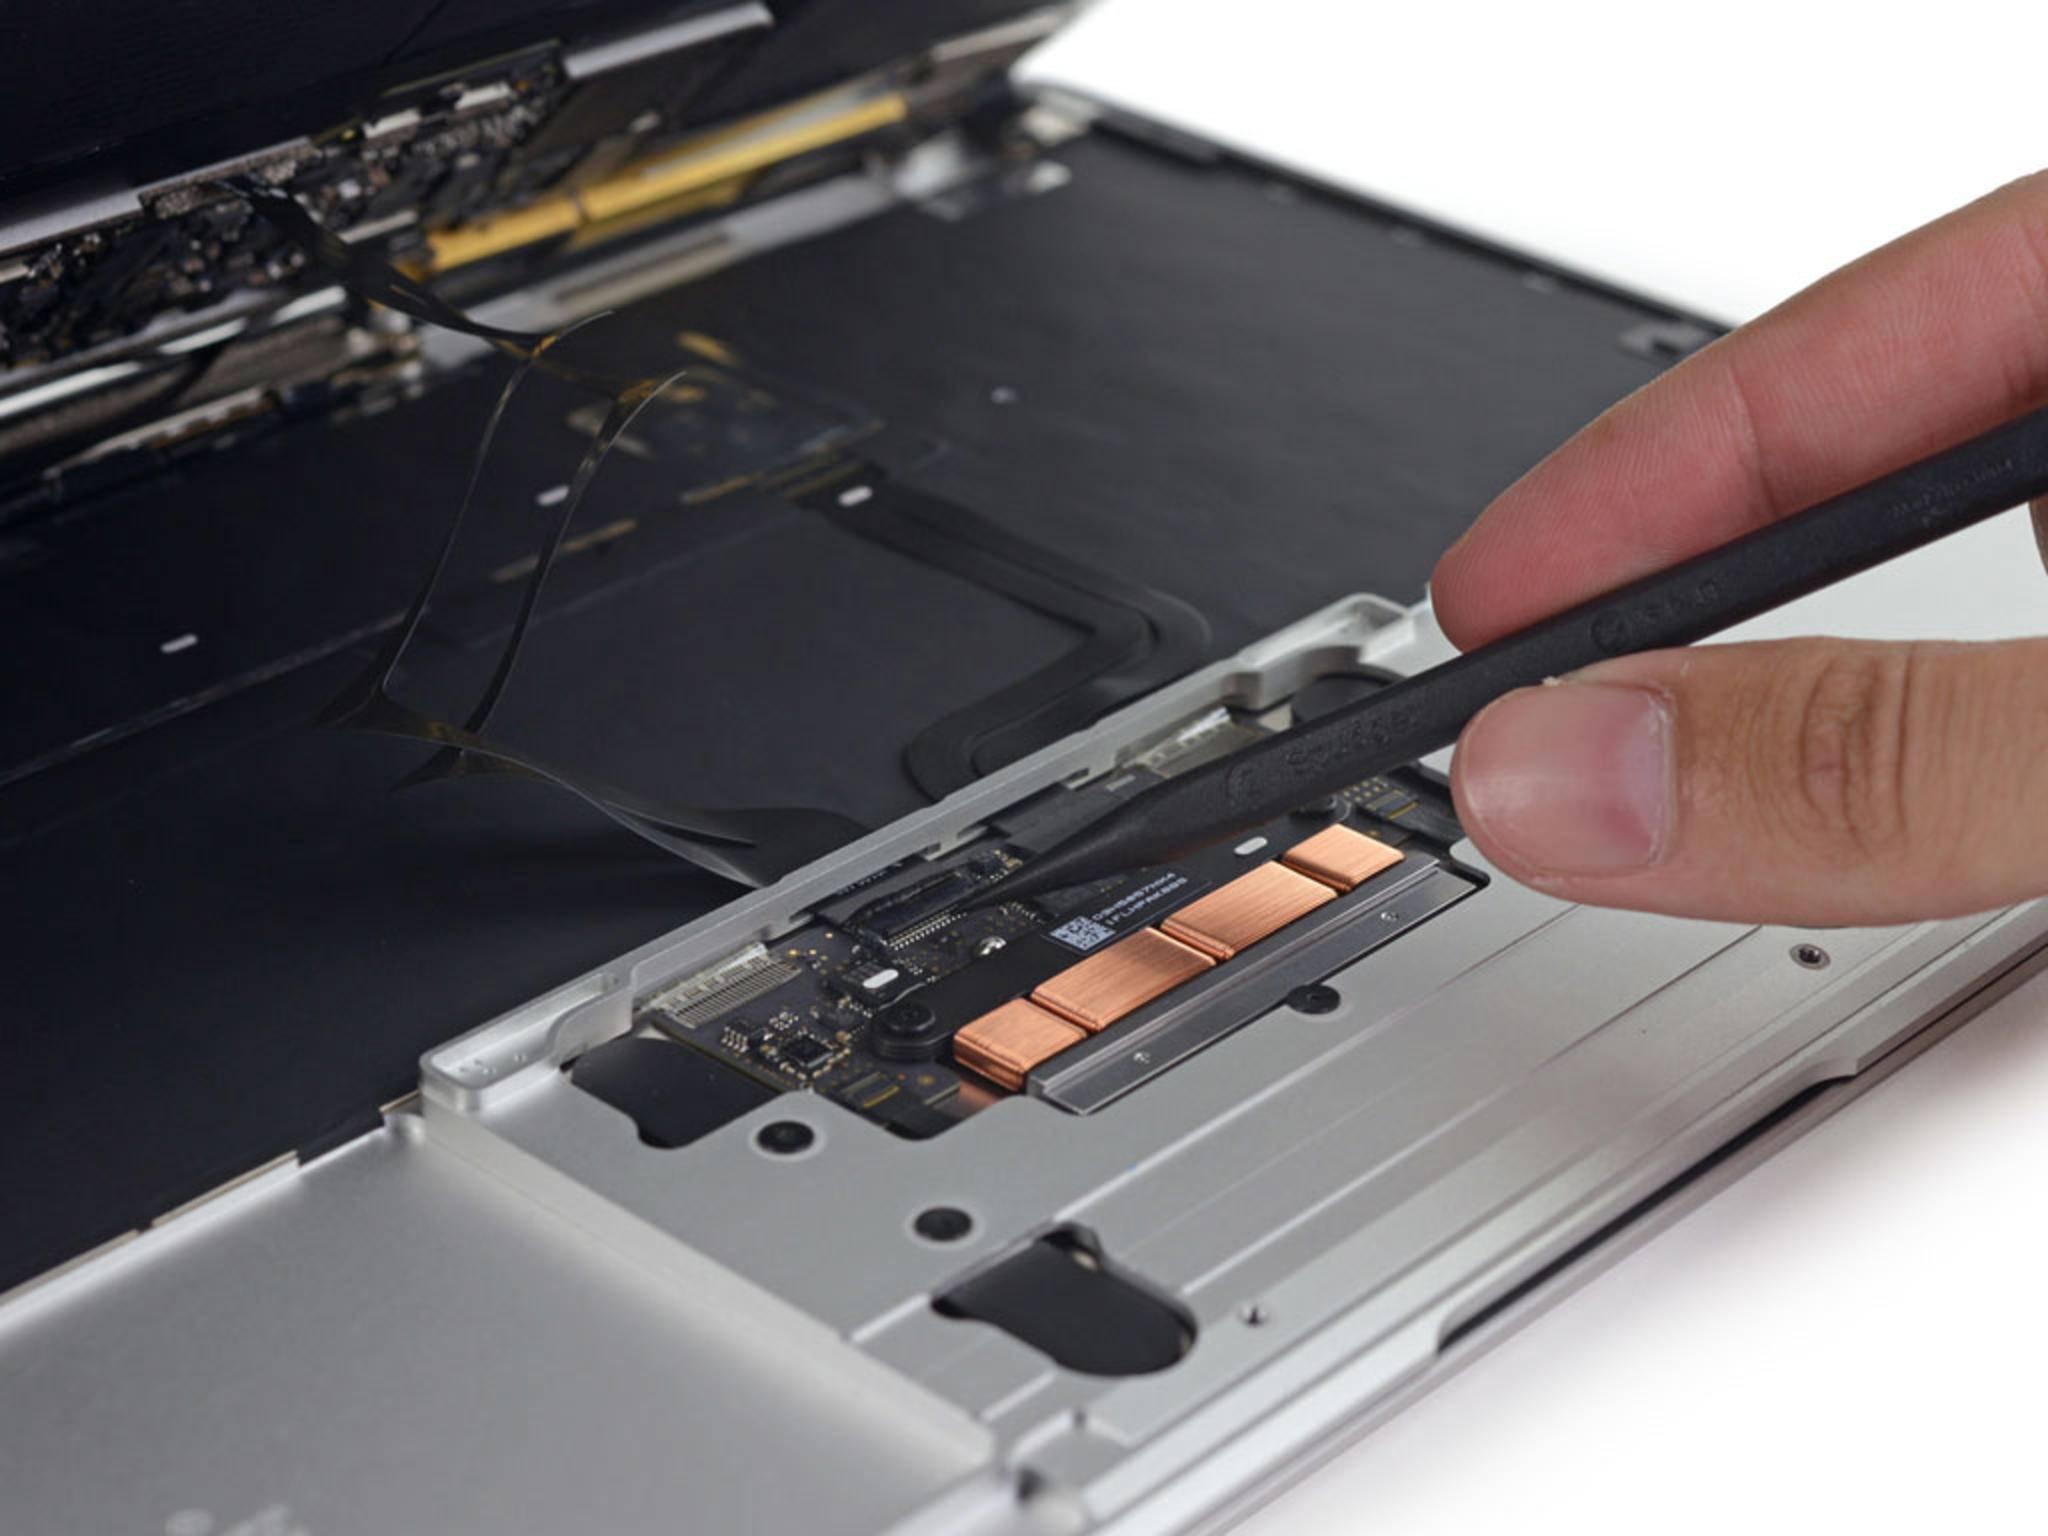 Ifixit: MacBook